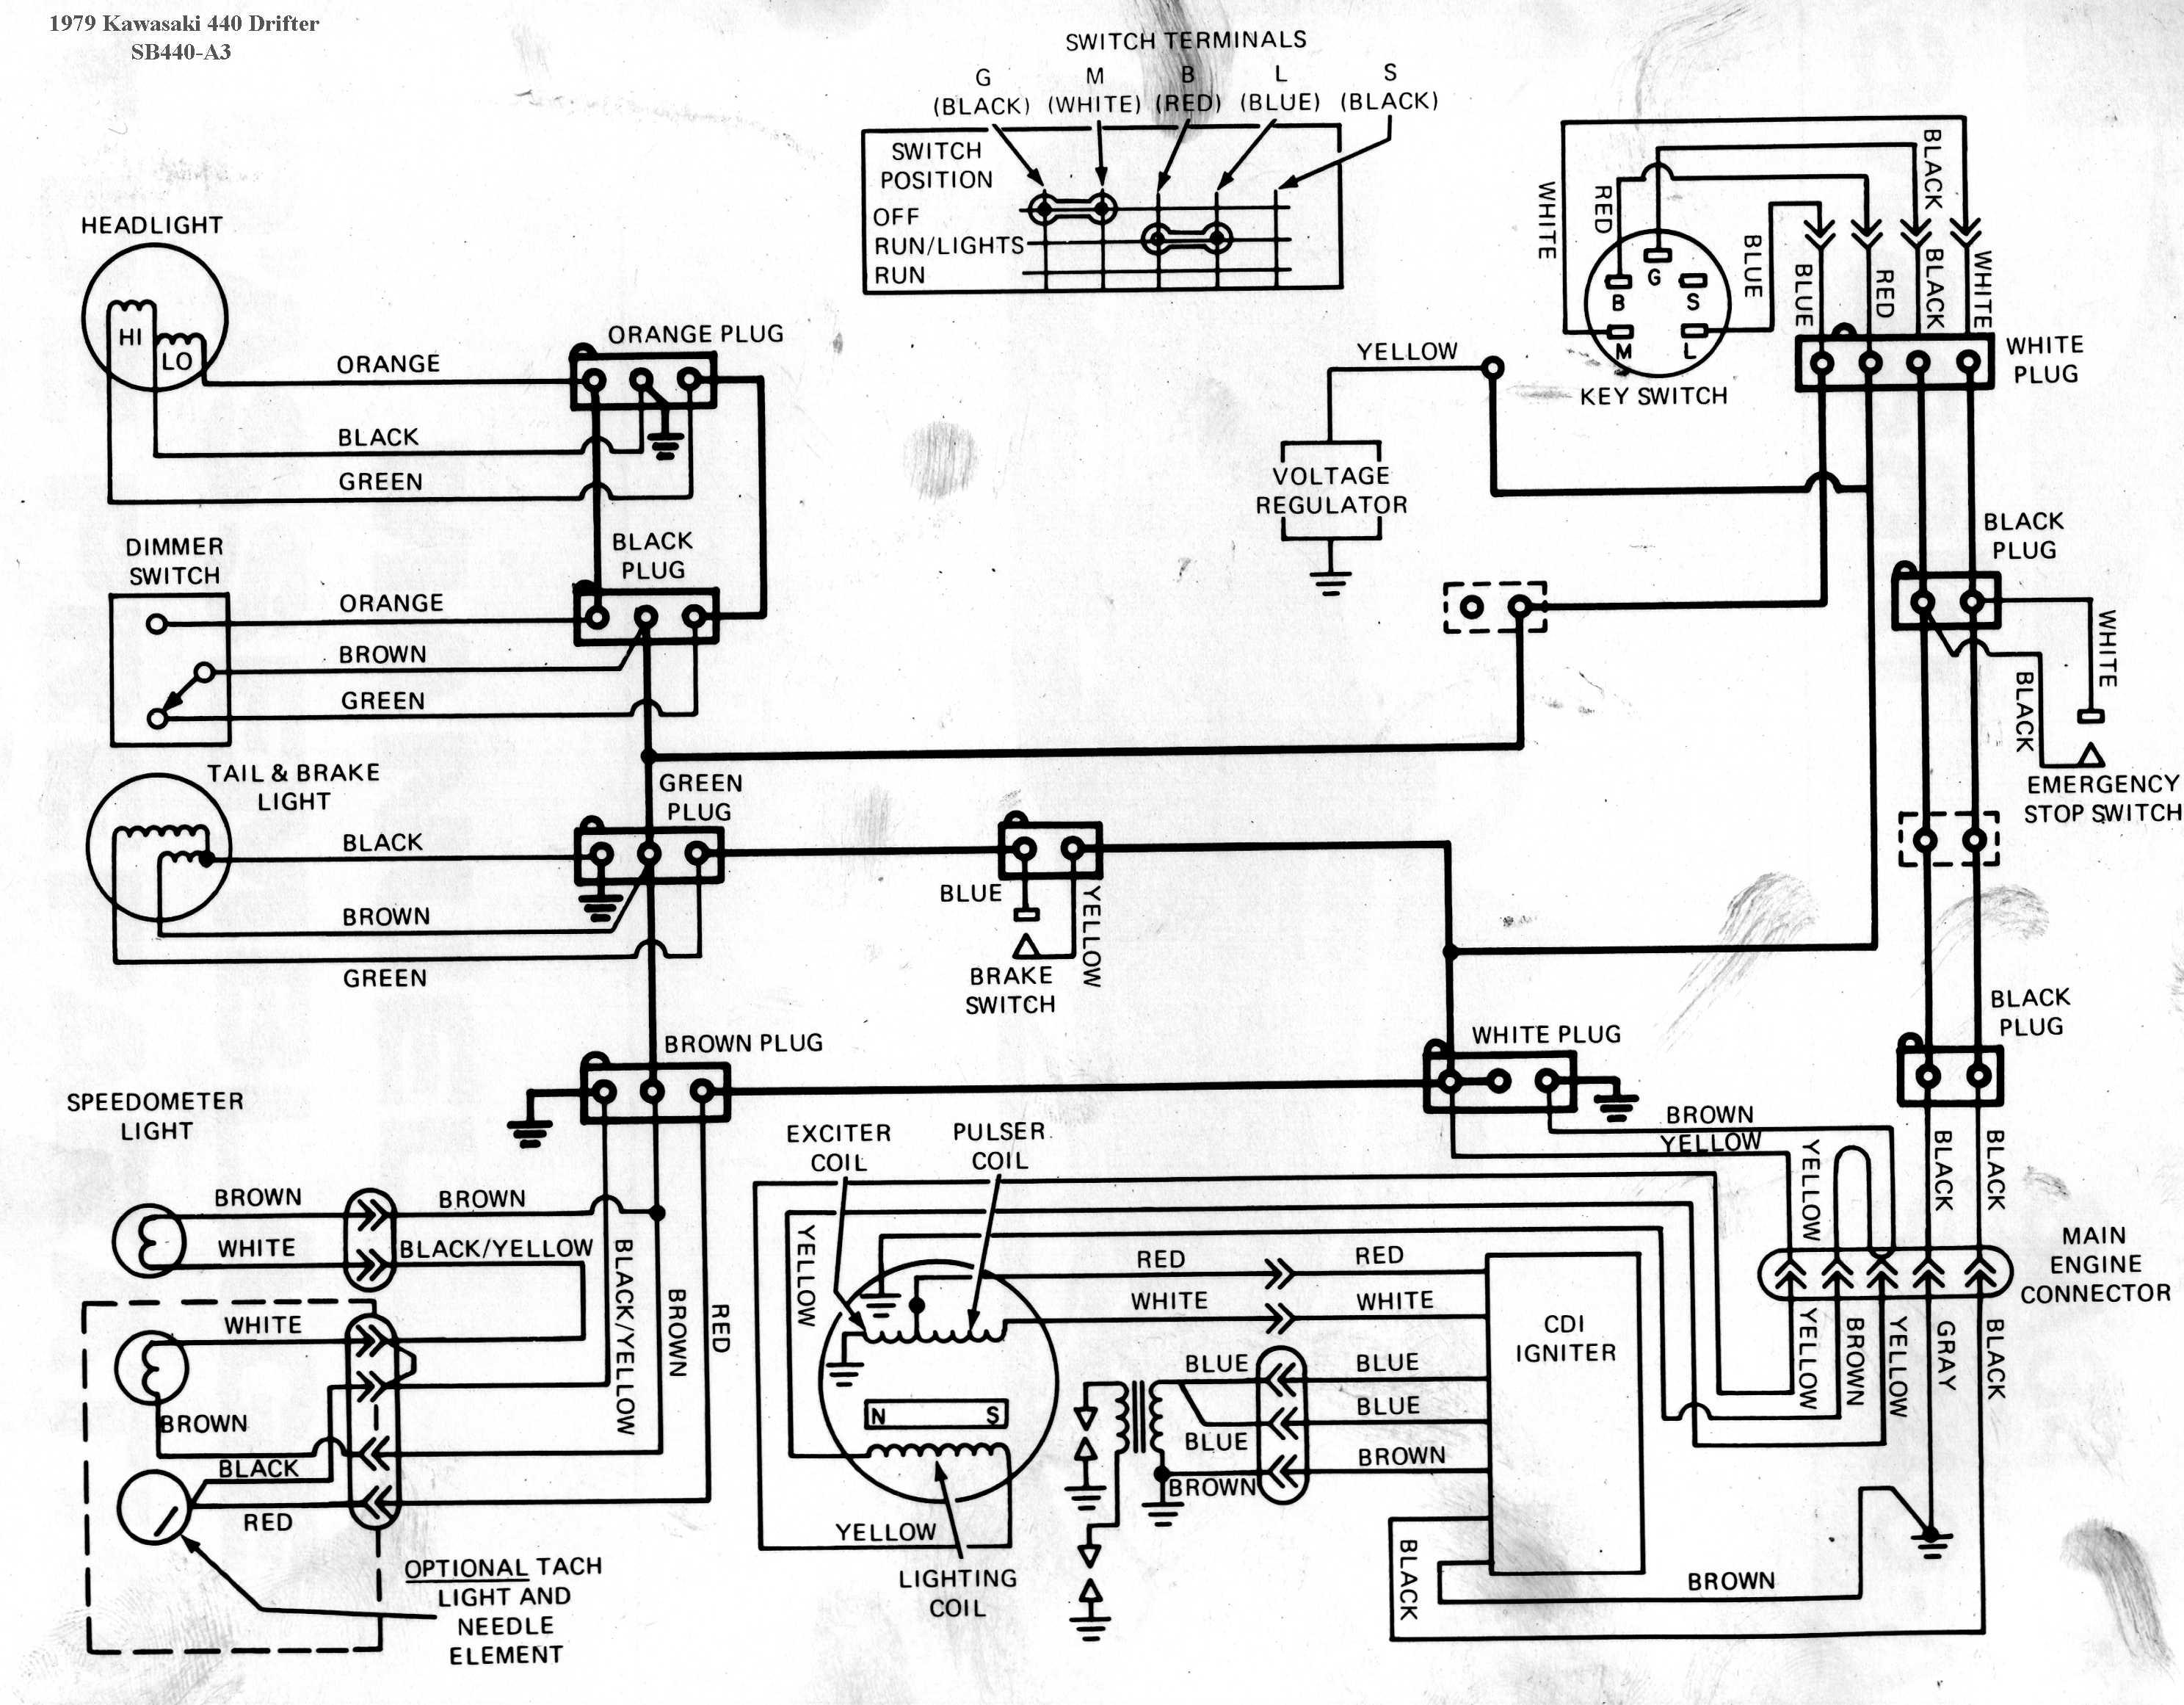 john deere 1020 wiring diagram kenworth t600 headlight 4020 sb get free image about